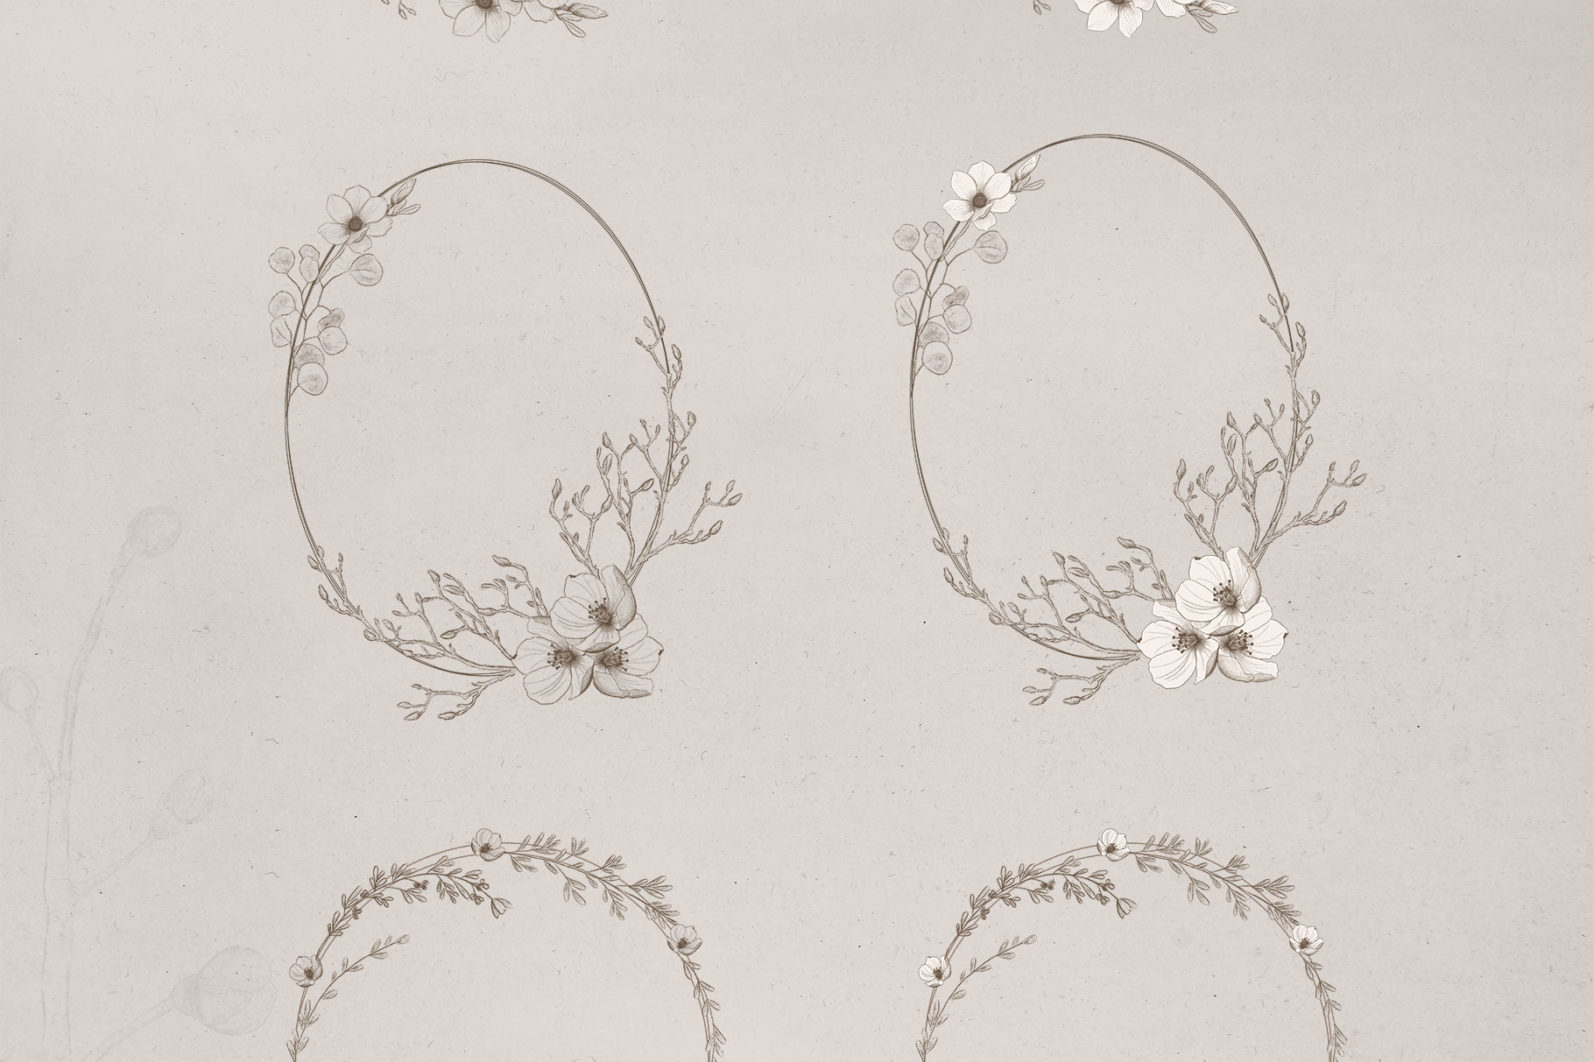 Sketchy Floral Wreaths & Borders - sketchy wreaths page -